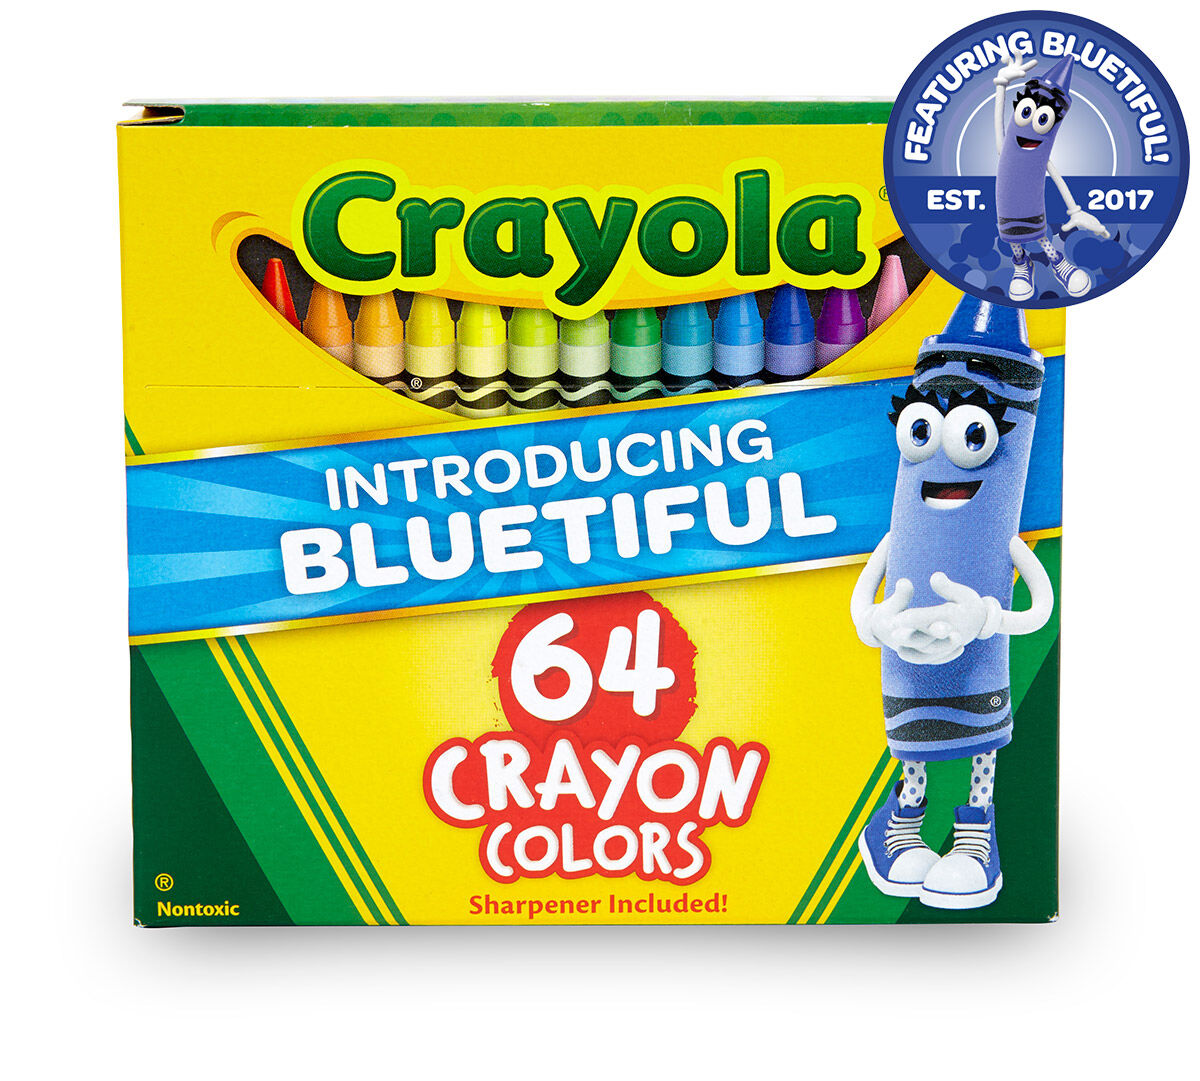 Crayola Crayons 64 ct. with Bluetiful